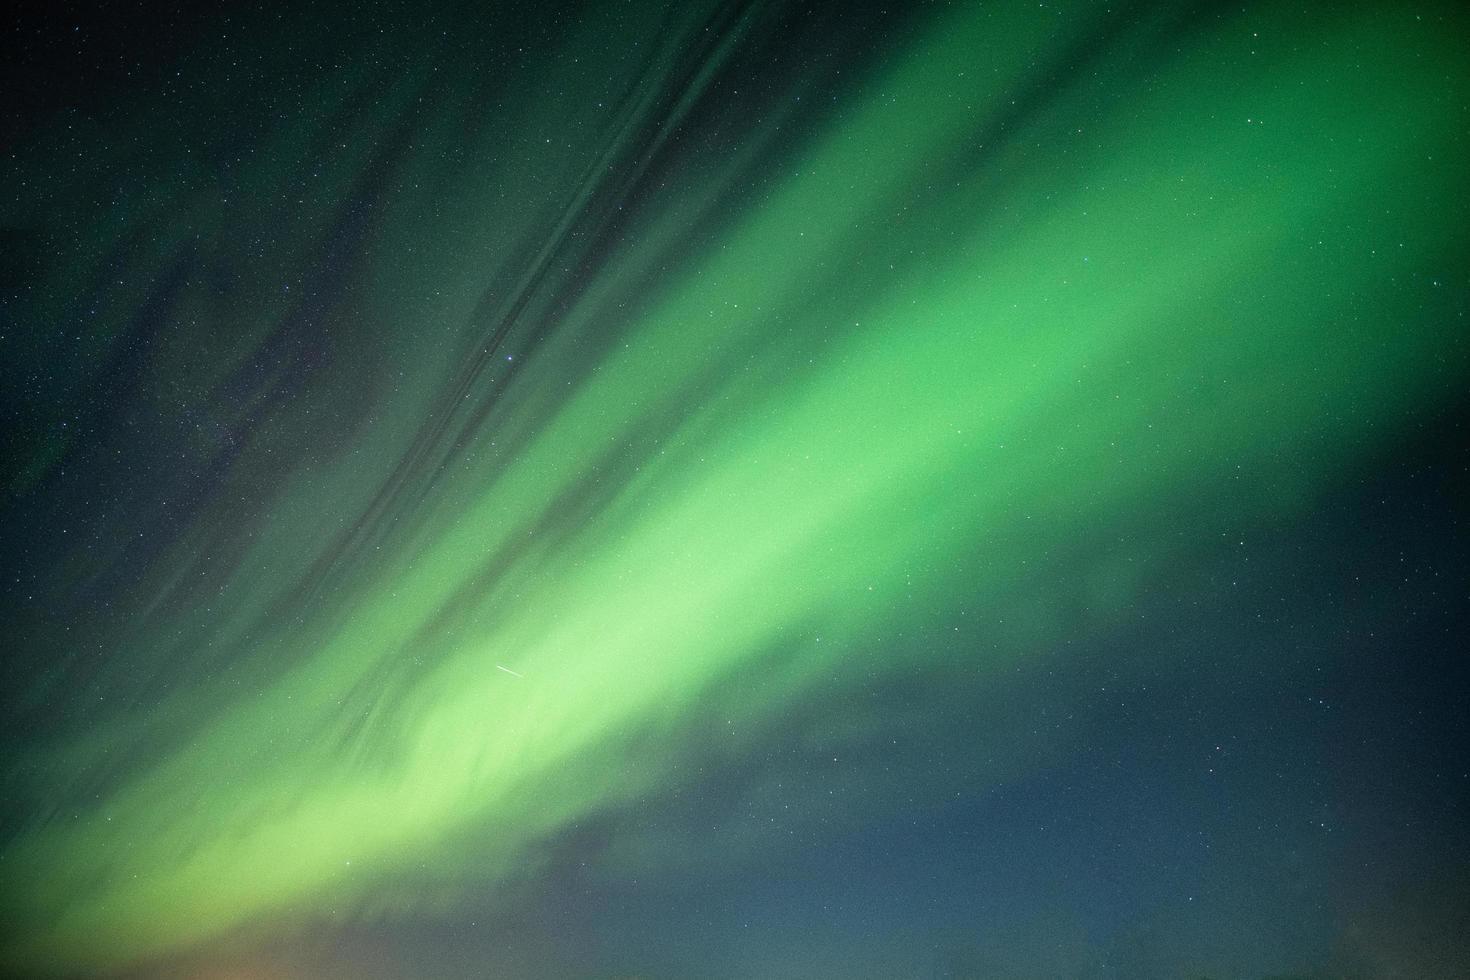 Northern lights in night sky photo